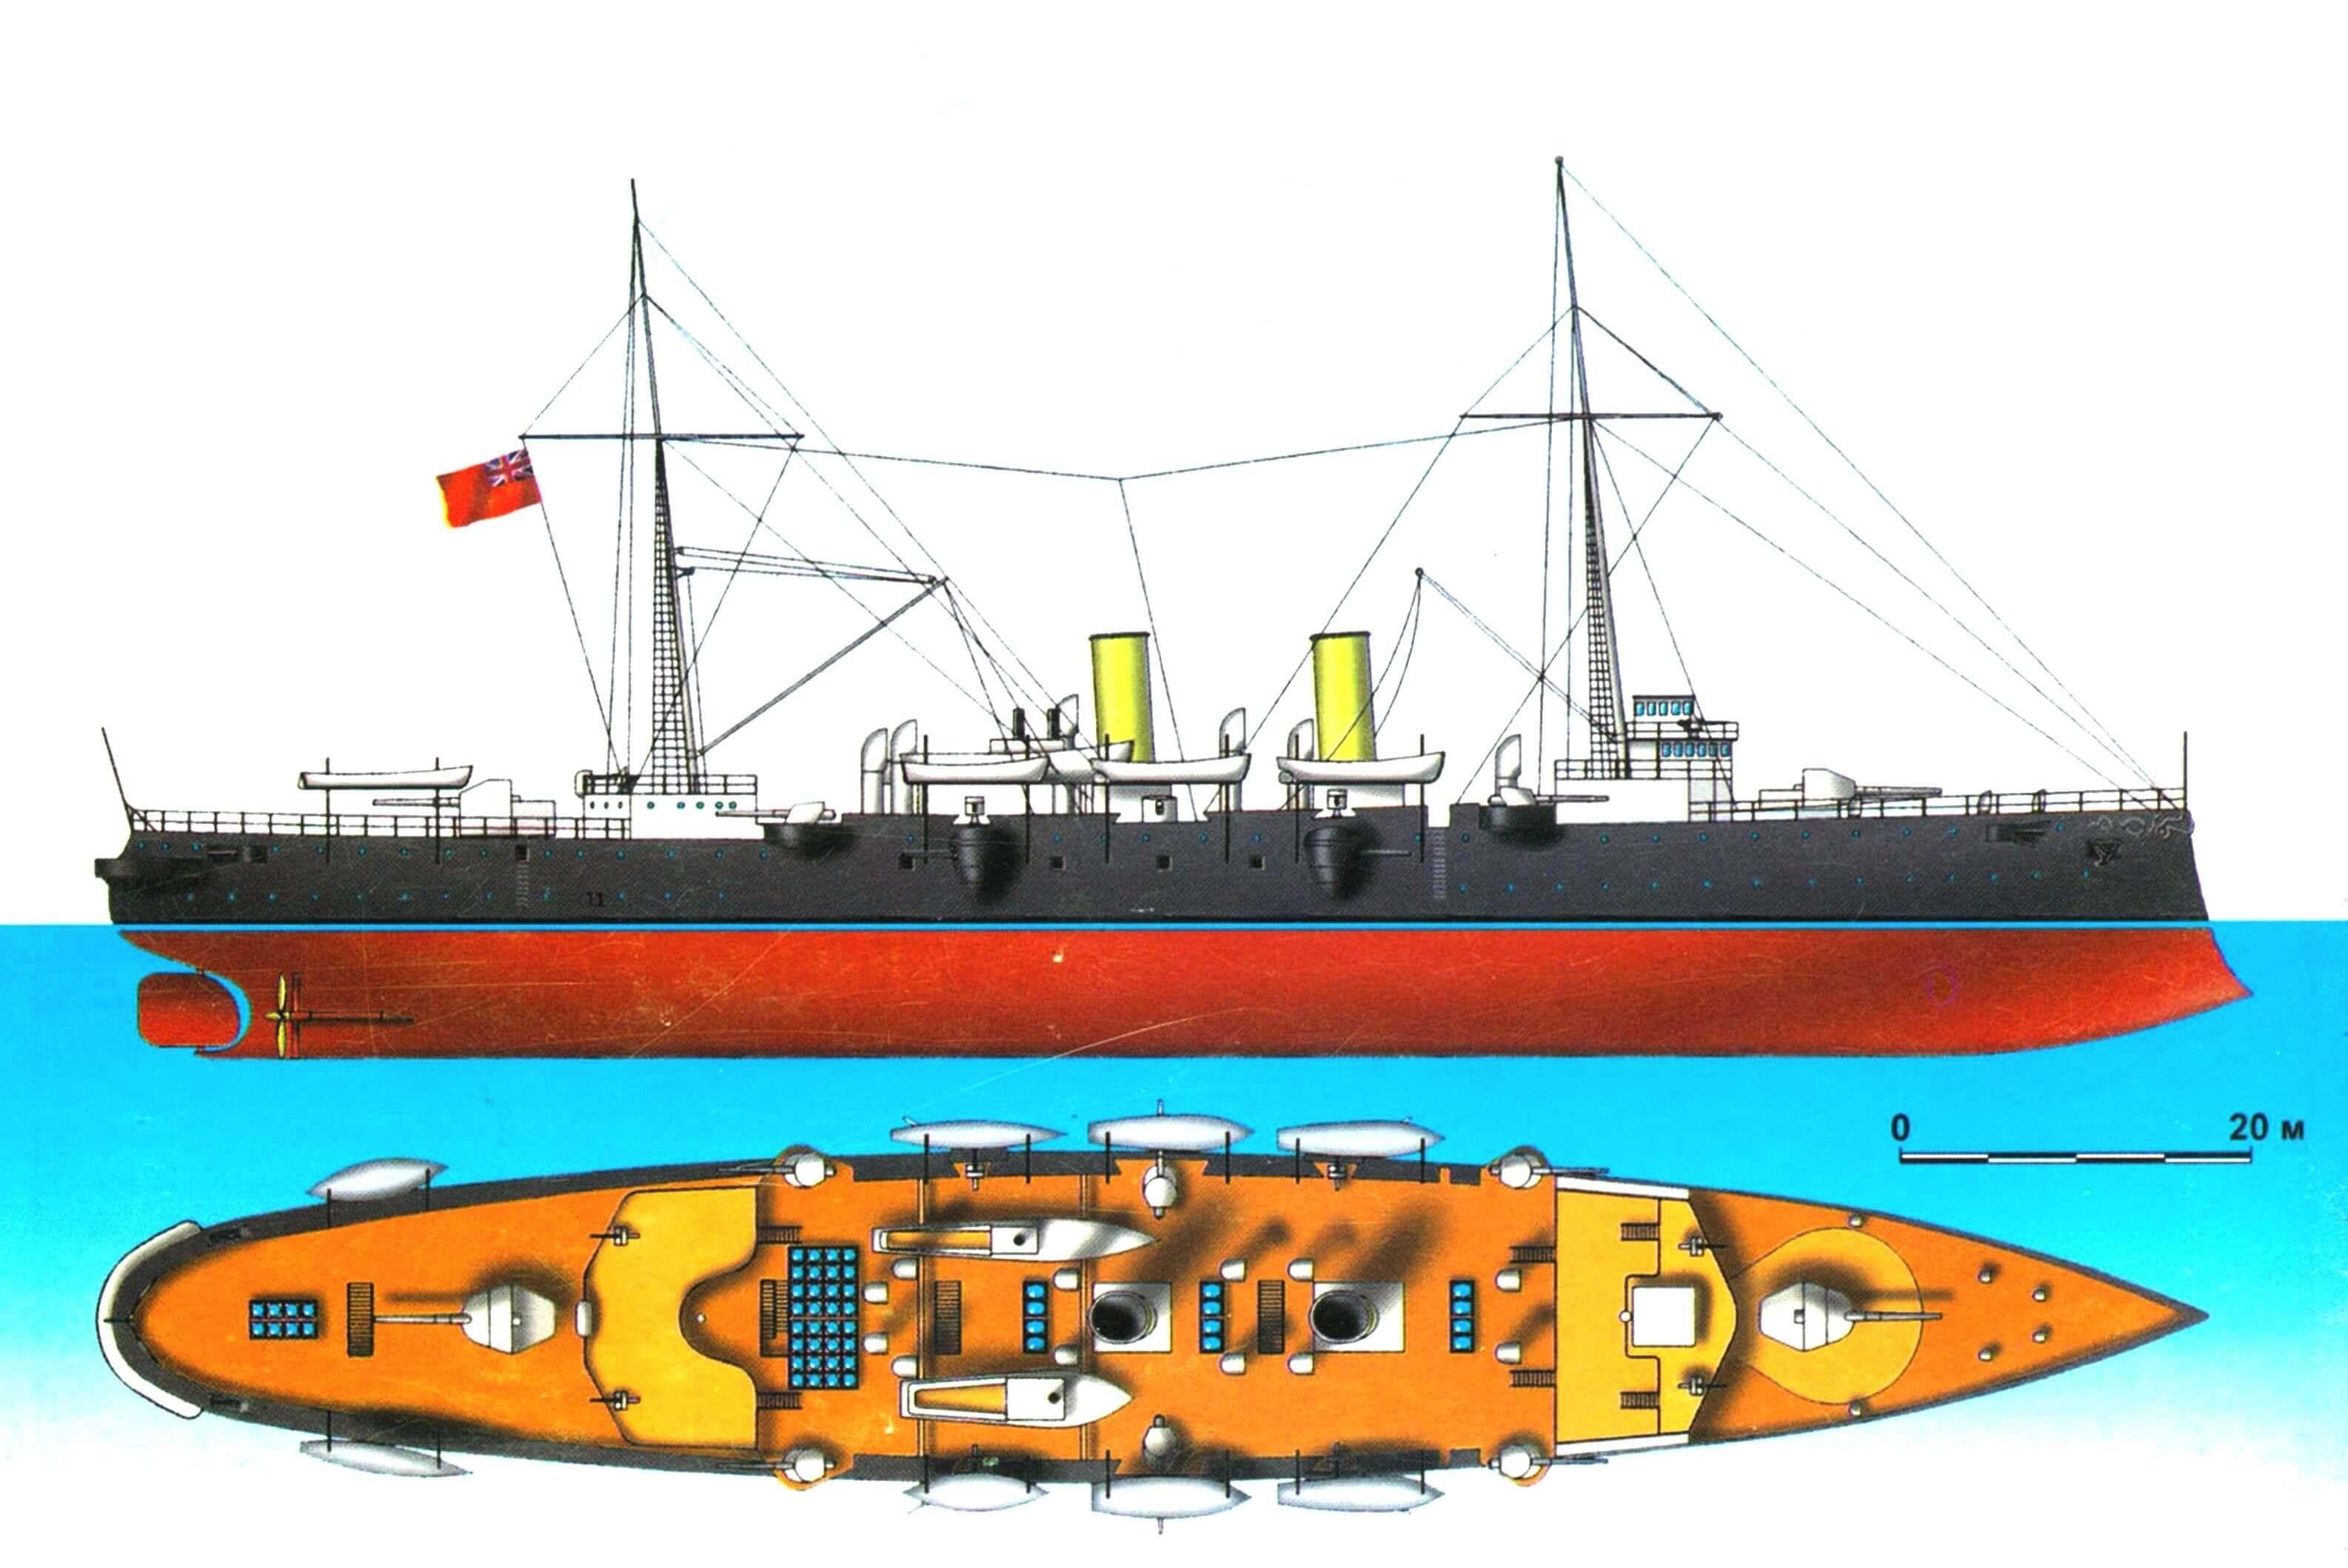 Бронепалубный крейсер «Эдгар» (Англия, 1893 г.)